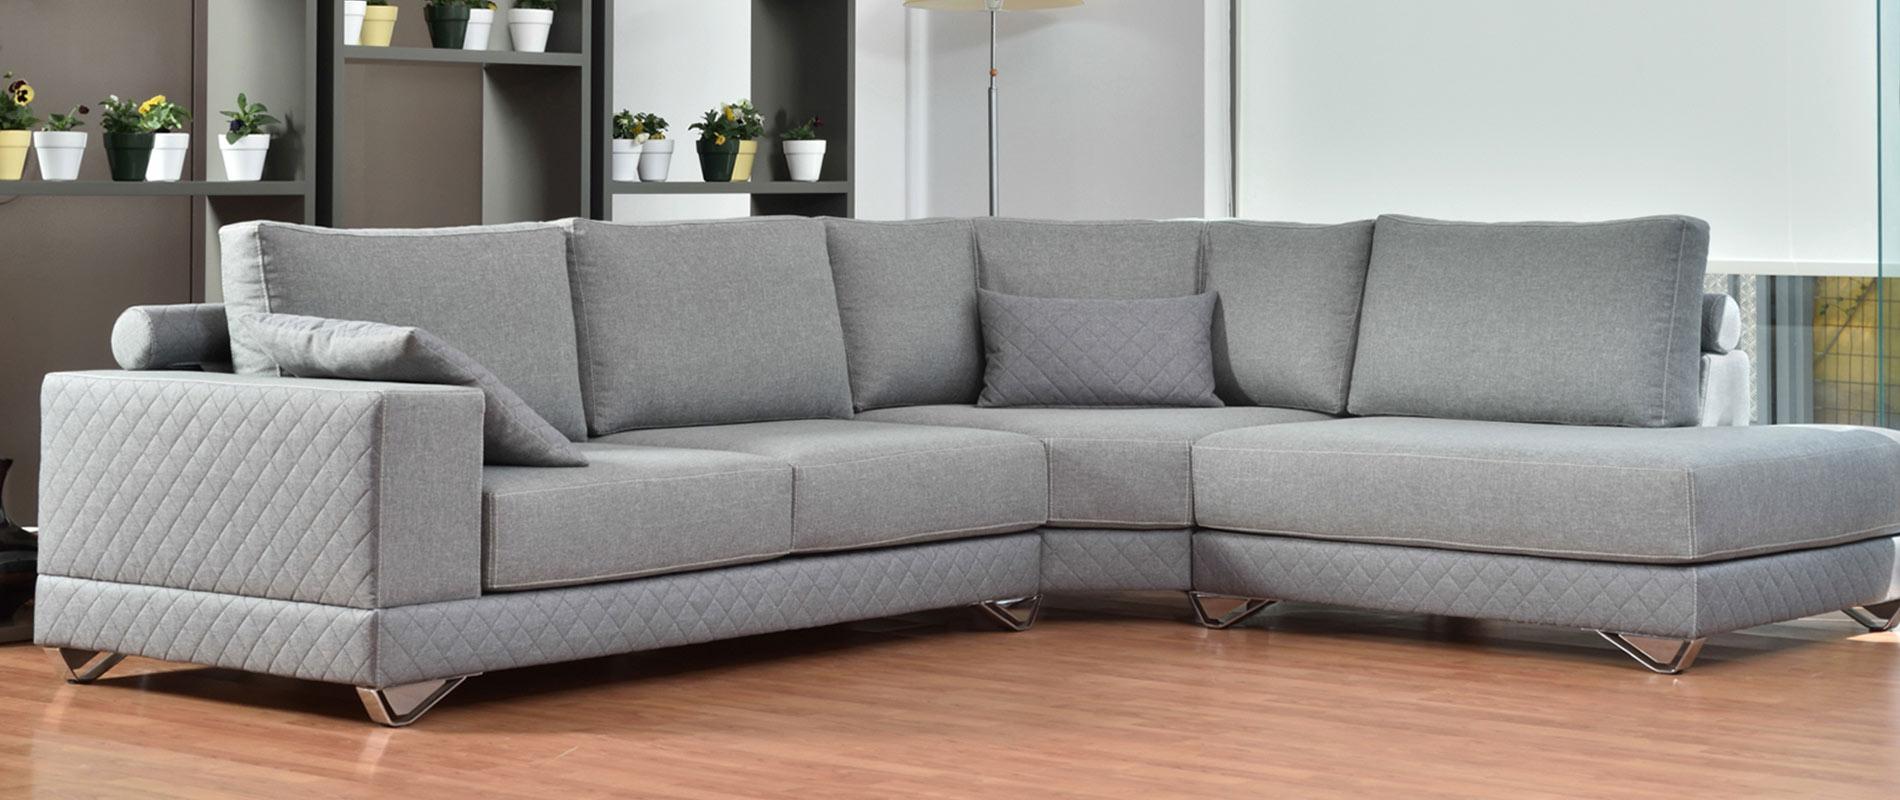 Modern Corner Sofas Έ ό